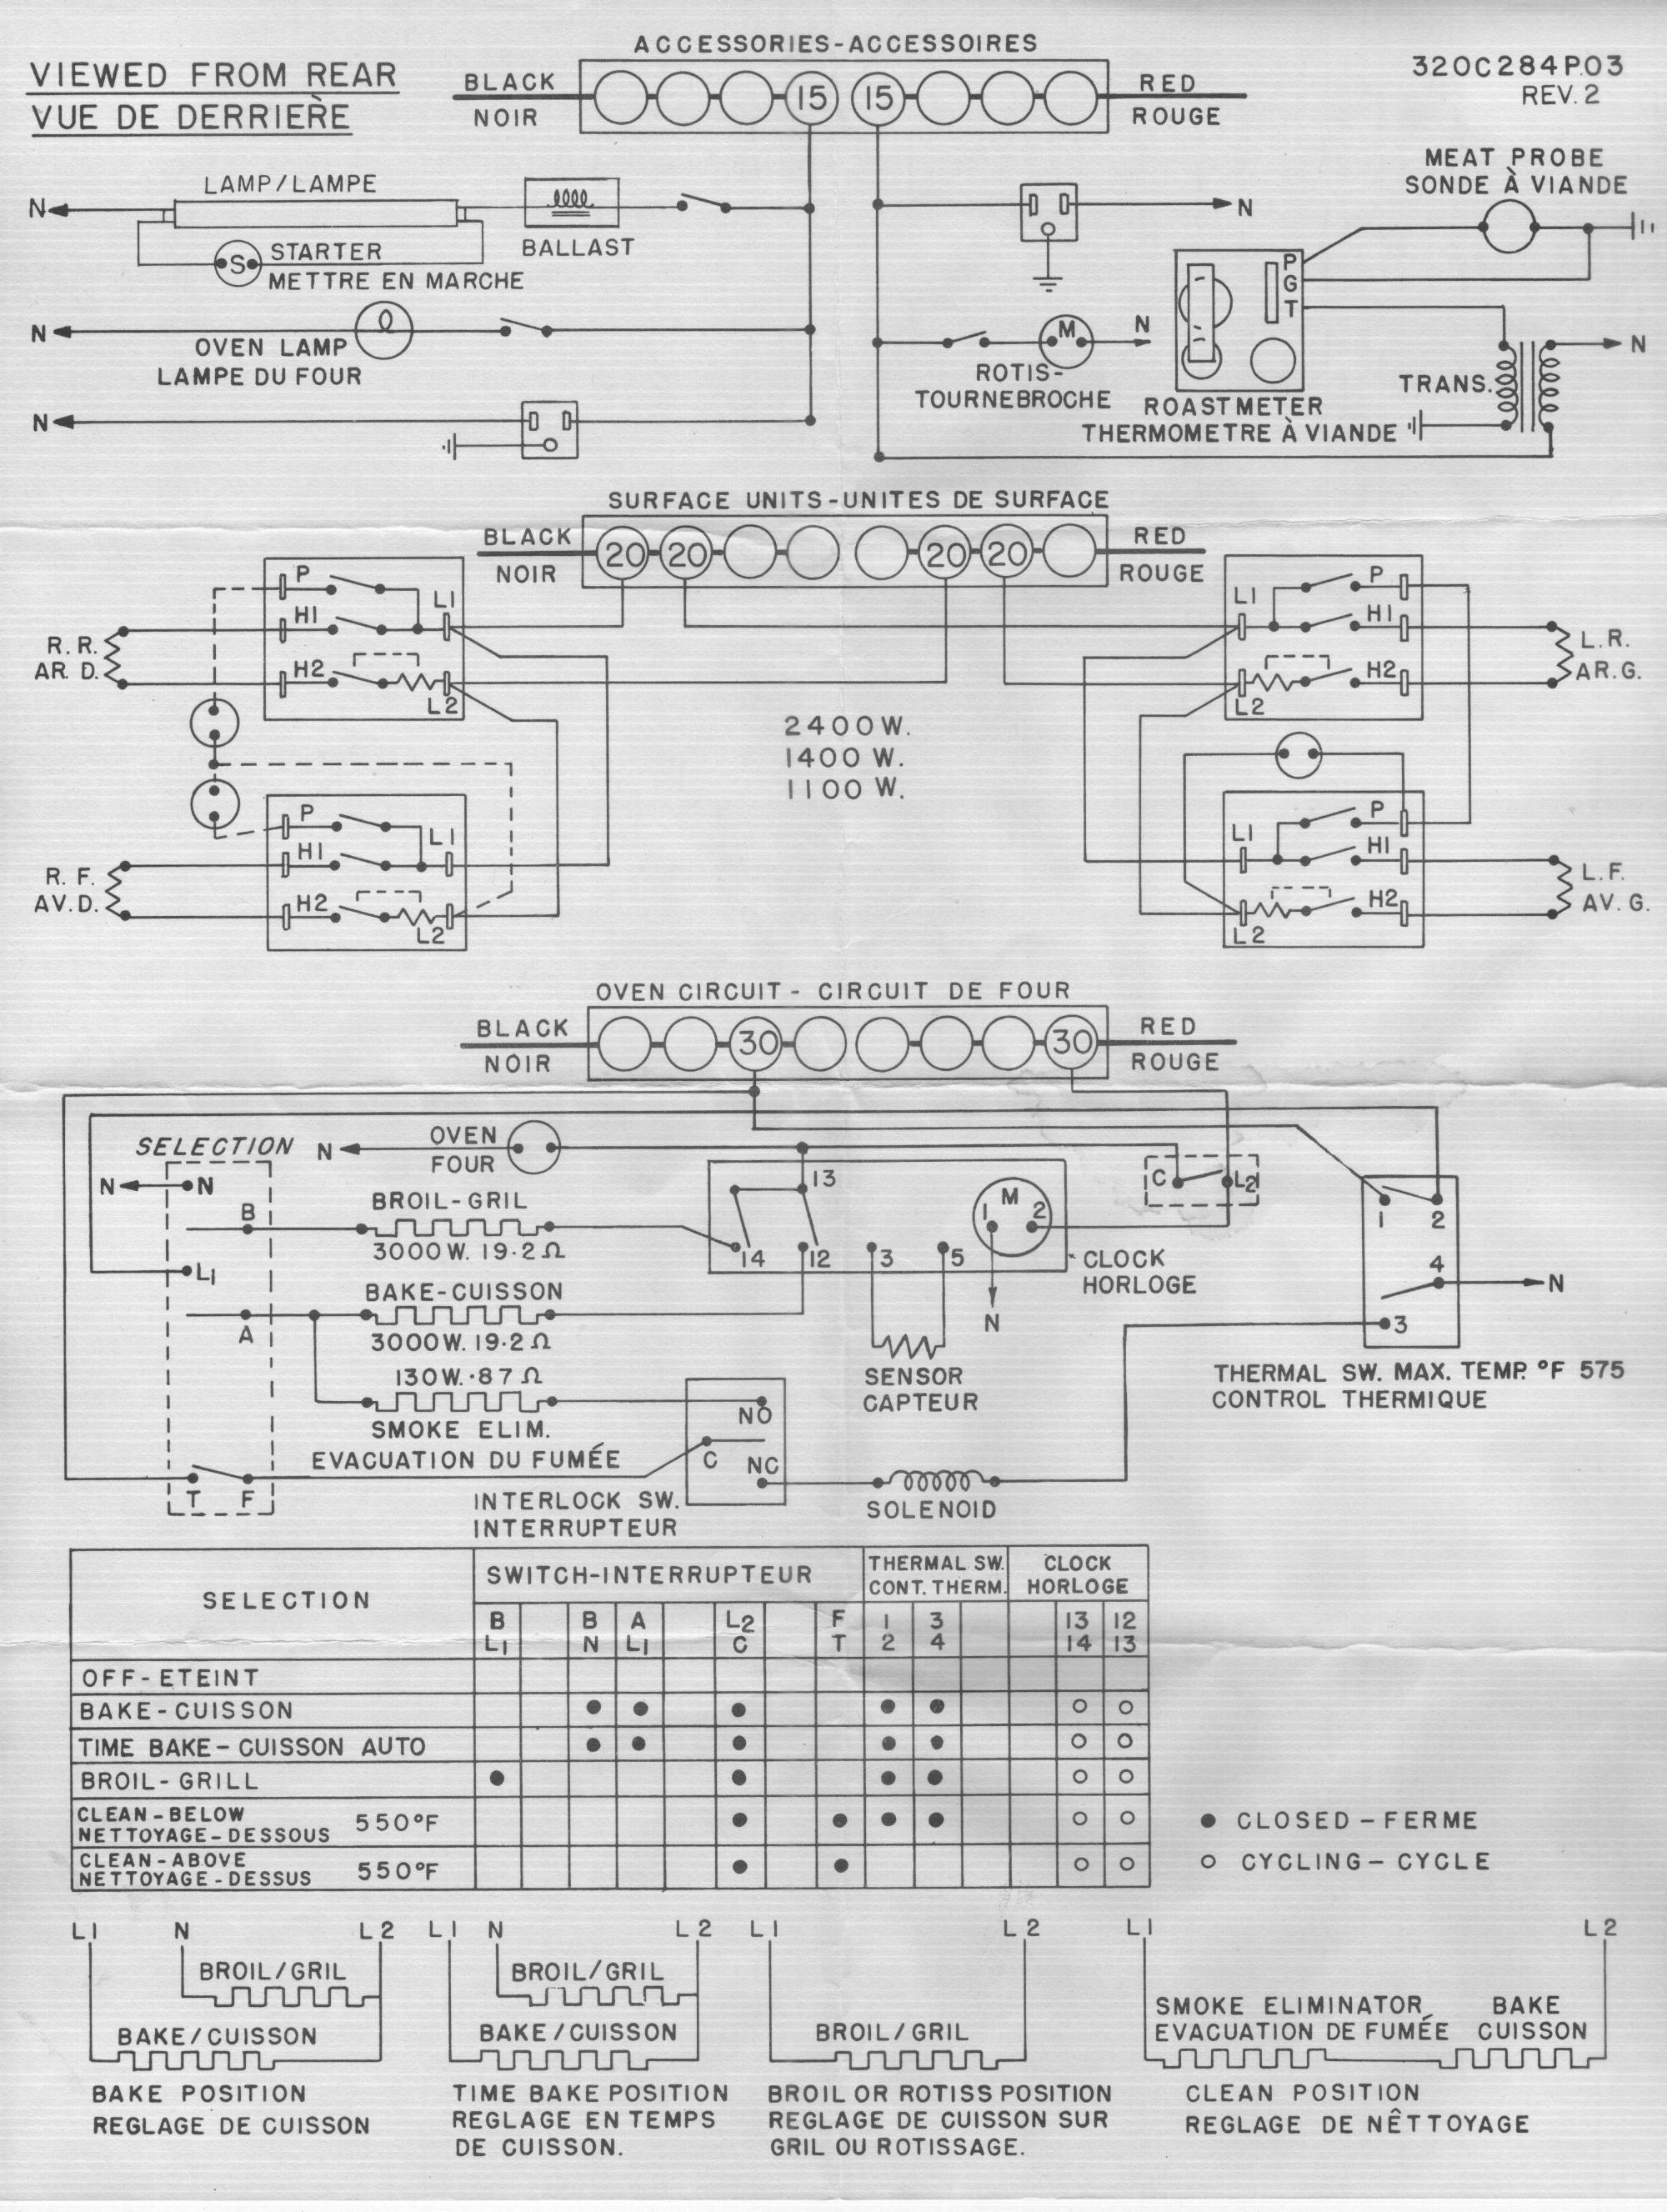 Diagram Hotpoint Range Wiring Diagram Full Version Hd Quality Wiring Diagram Diagramhatchk Natalenellacittadellegrotte It